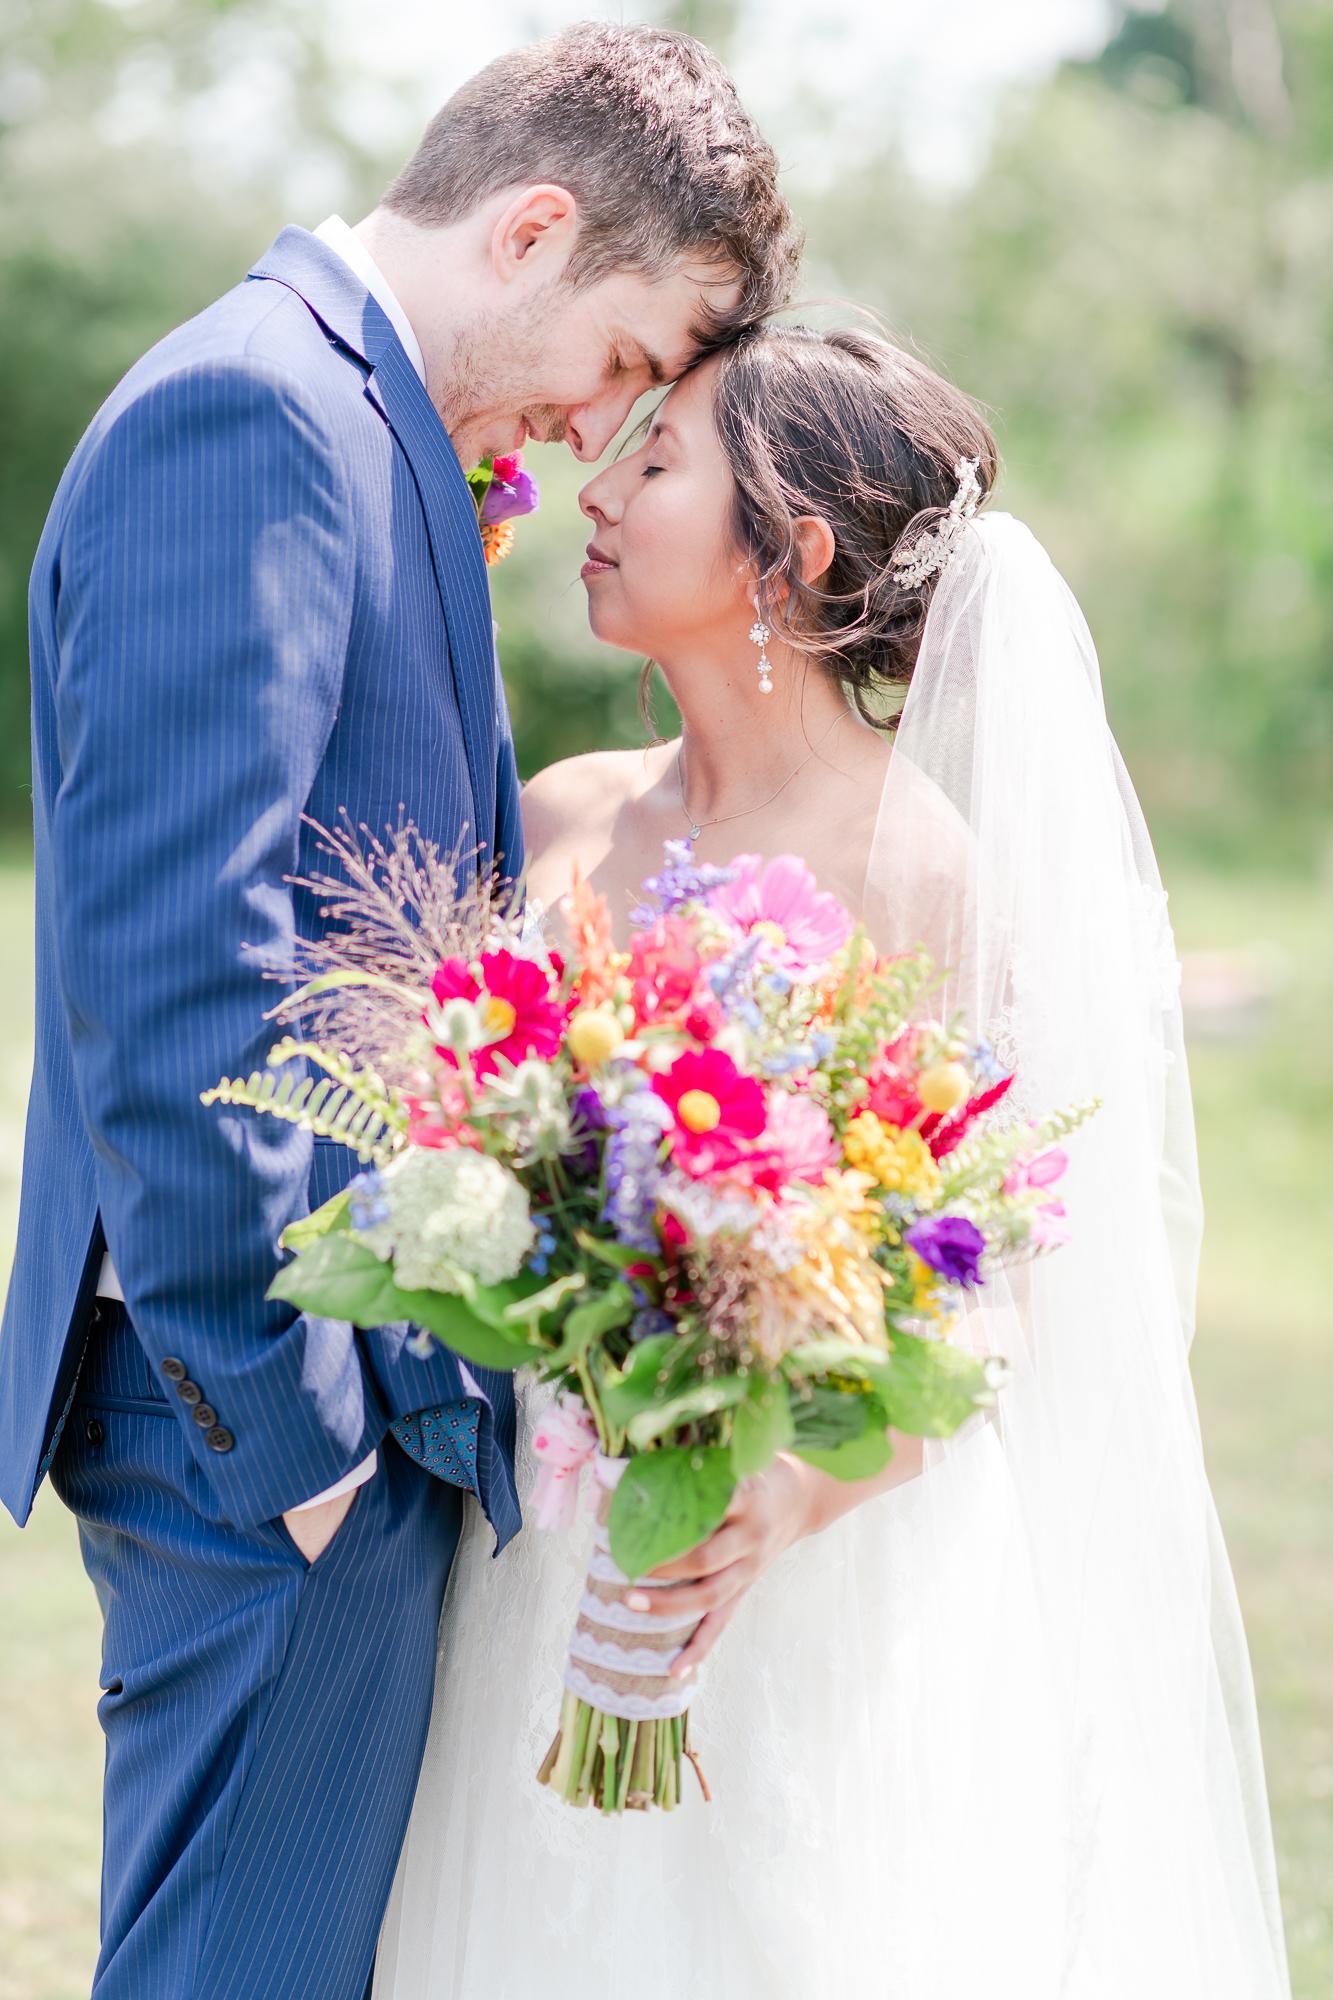 Maria+Adam_Summer Barn Wedding_The Barn and The North Star Preserve_Oberlin_Ohio-135.jpg